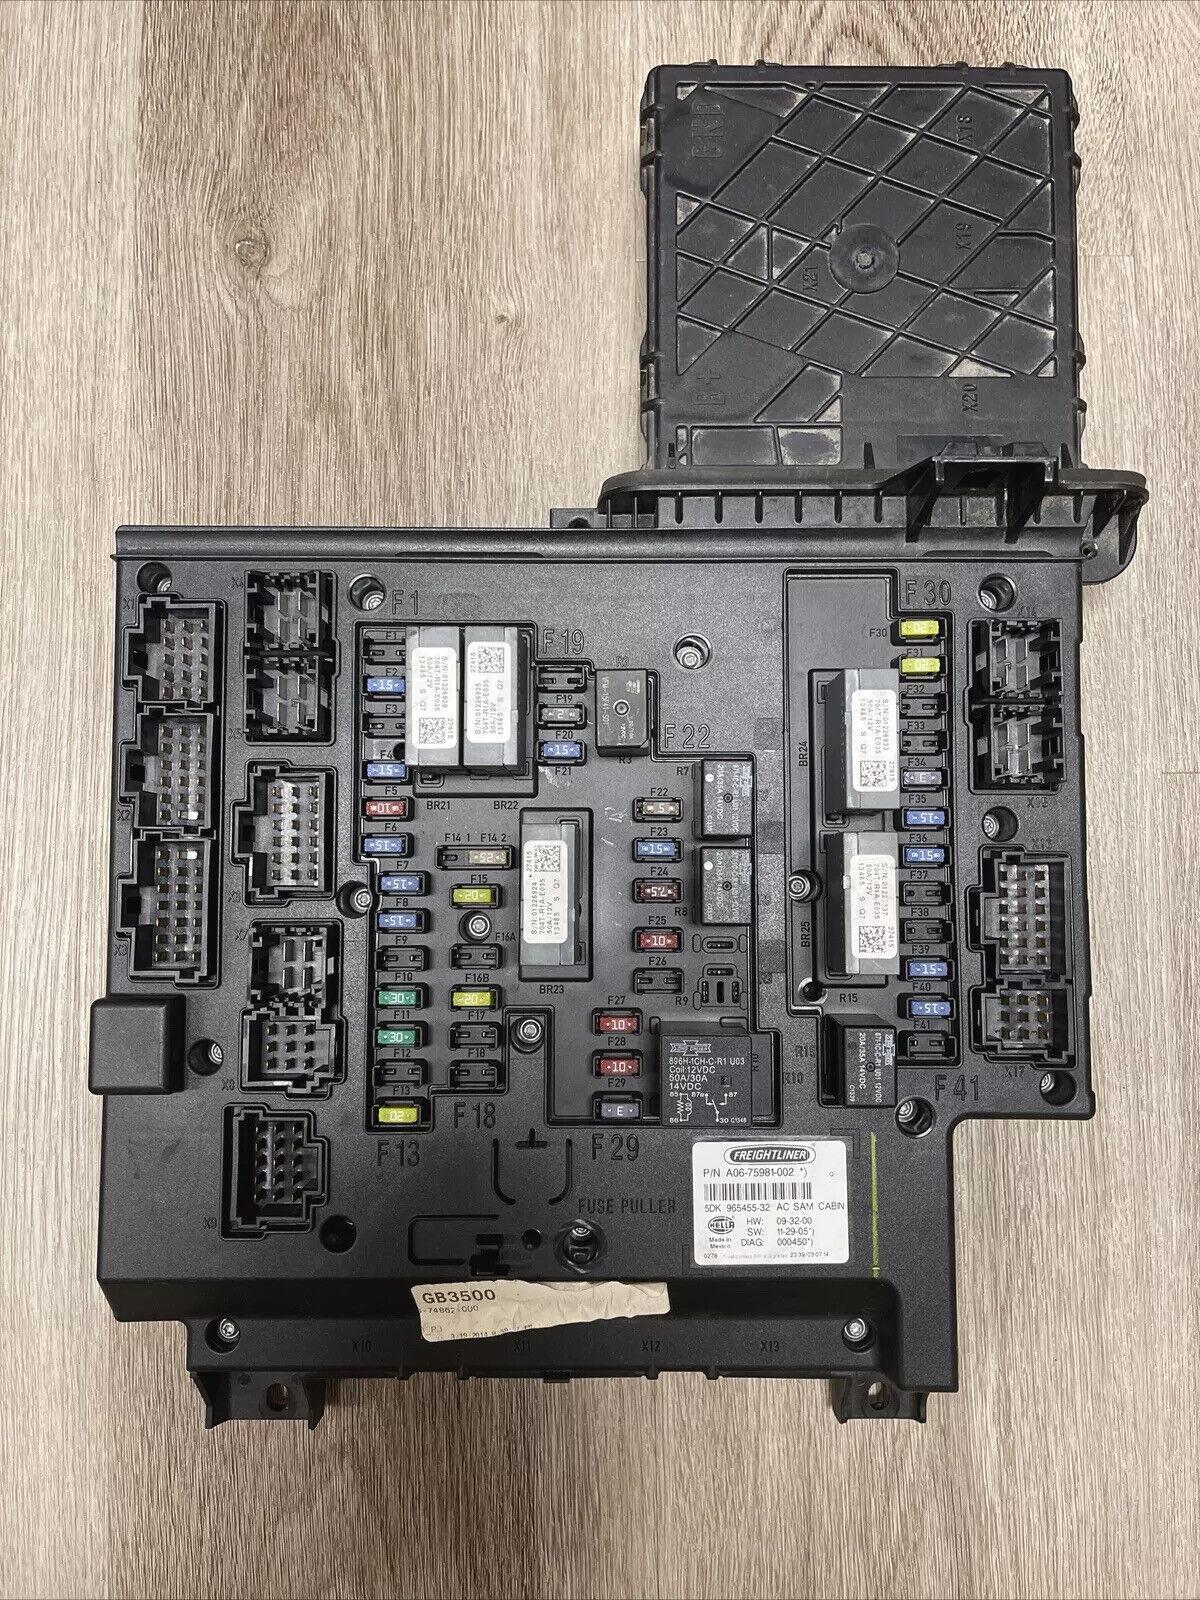 Driver Side with Install Kit 100W Halogen 6 Inch Cab Side Roof Mount Spotlight -Black Larson Electronics 1017OJII5JM 2014 Freightliner 114 Sd Ext